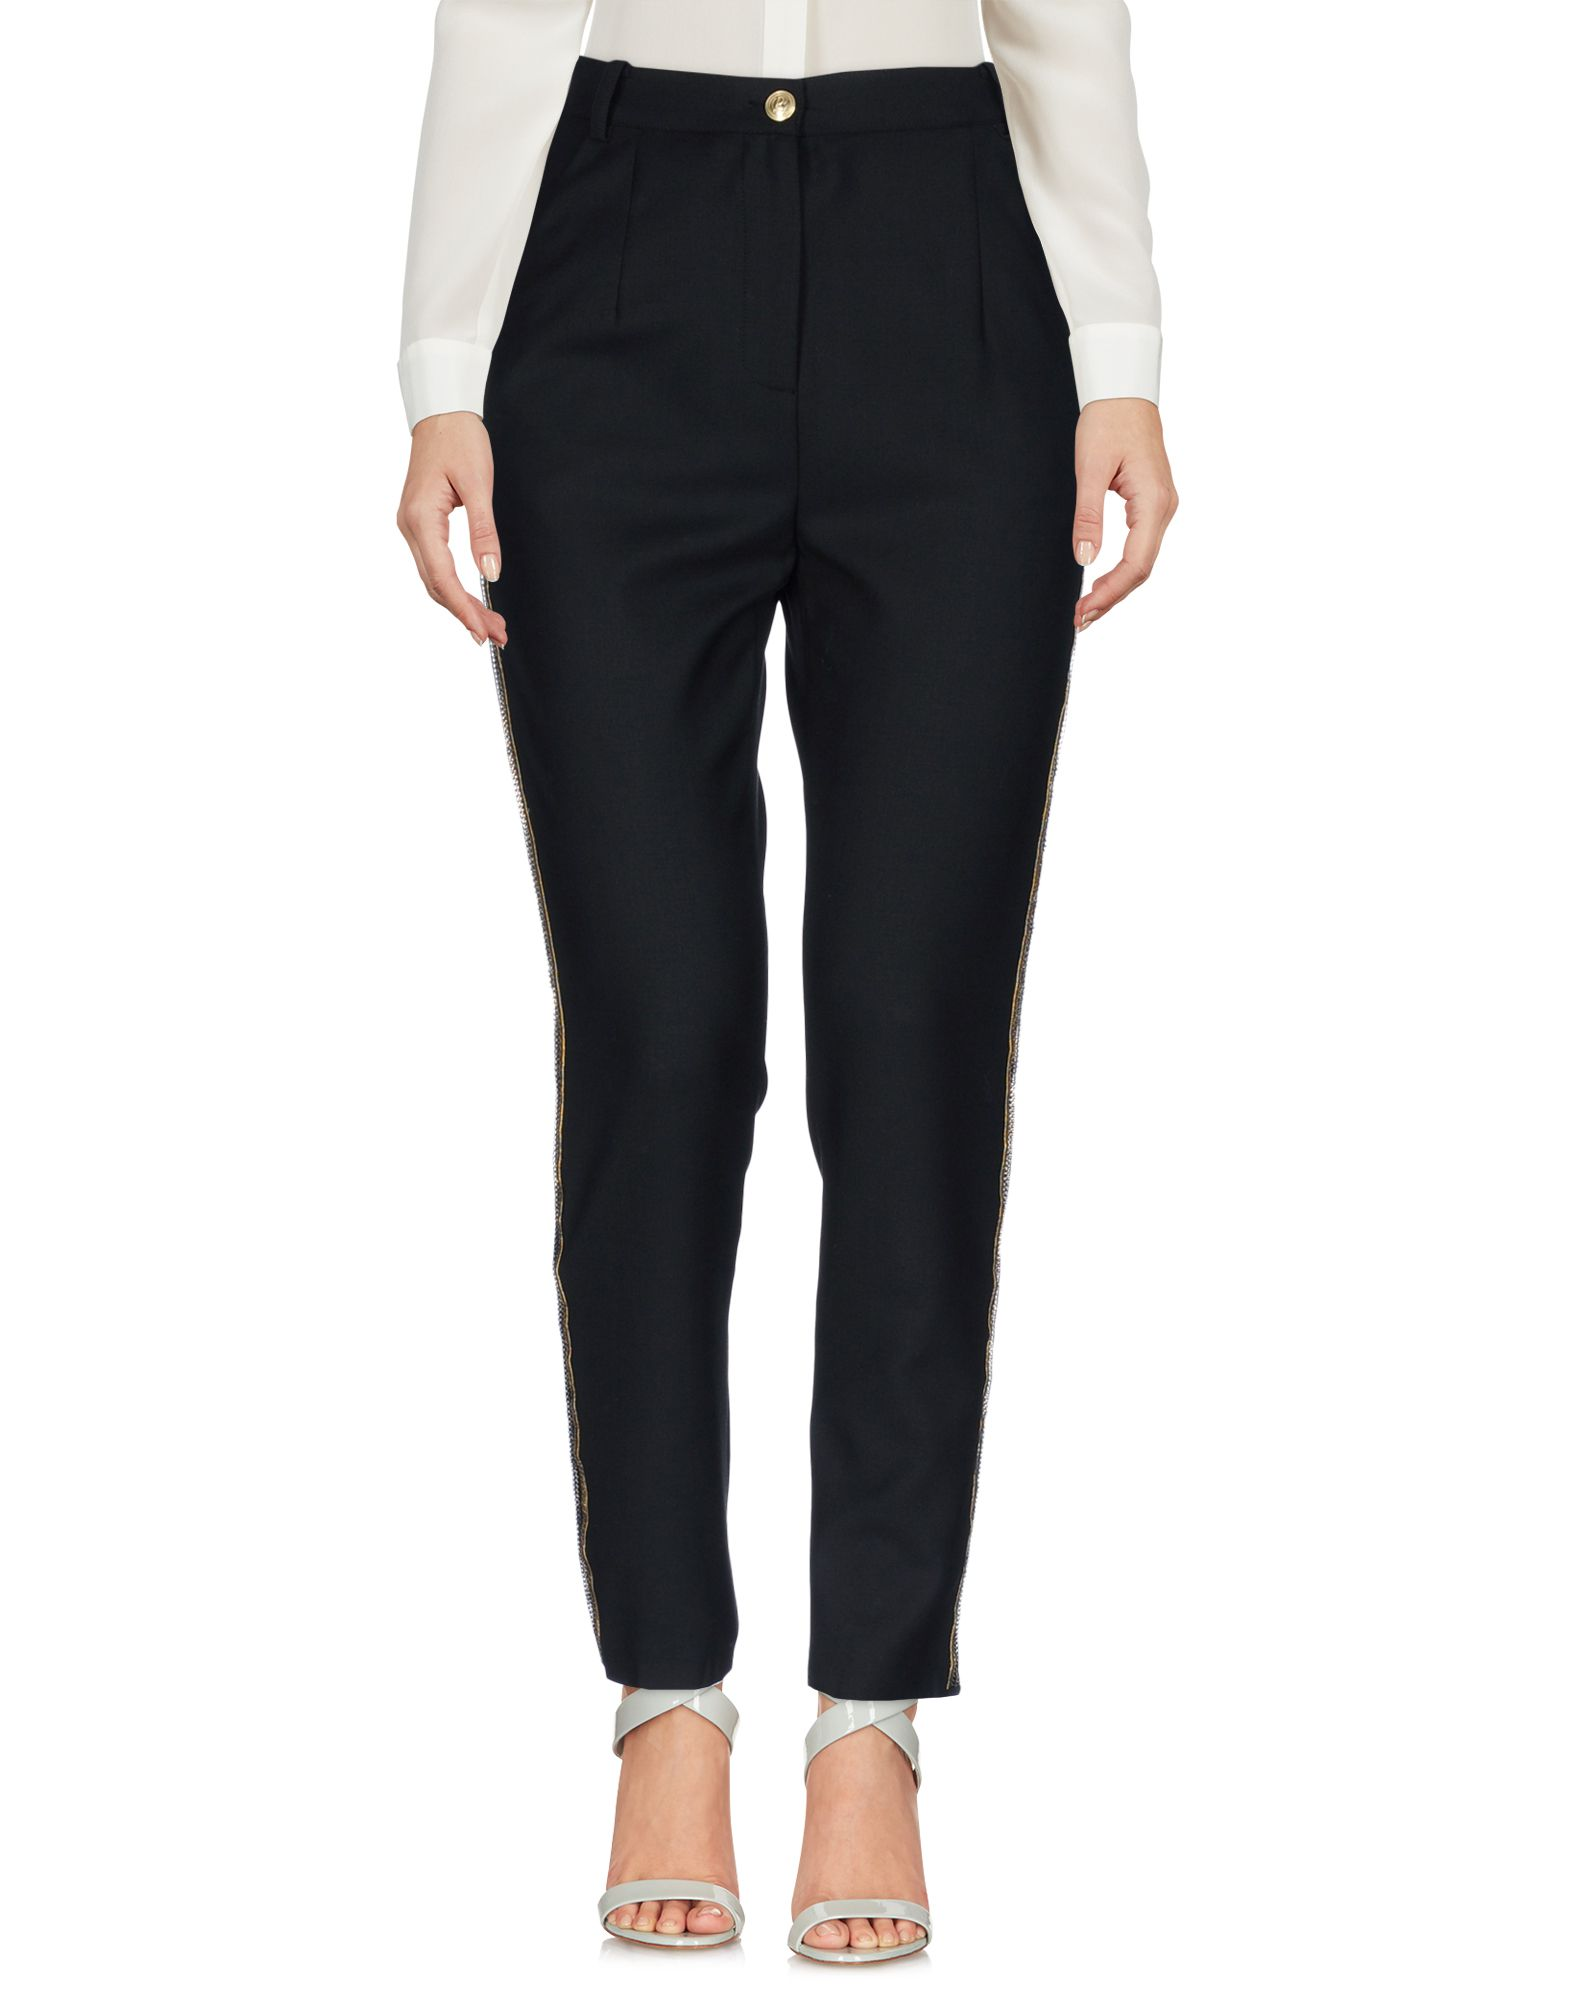 Pantalone Pierre Balmain Balmain donna - 13103095EC